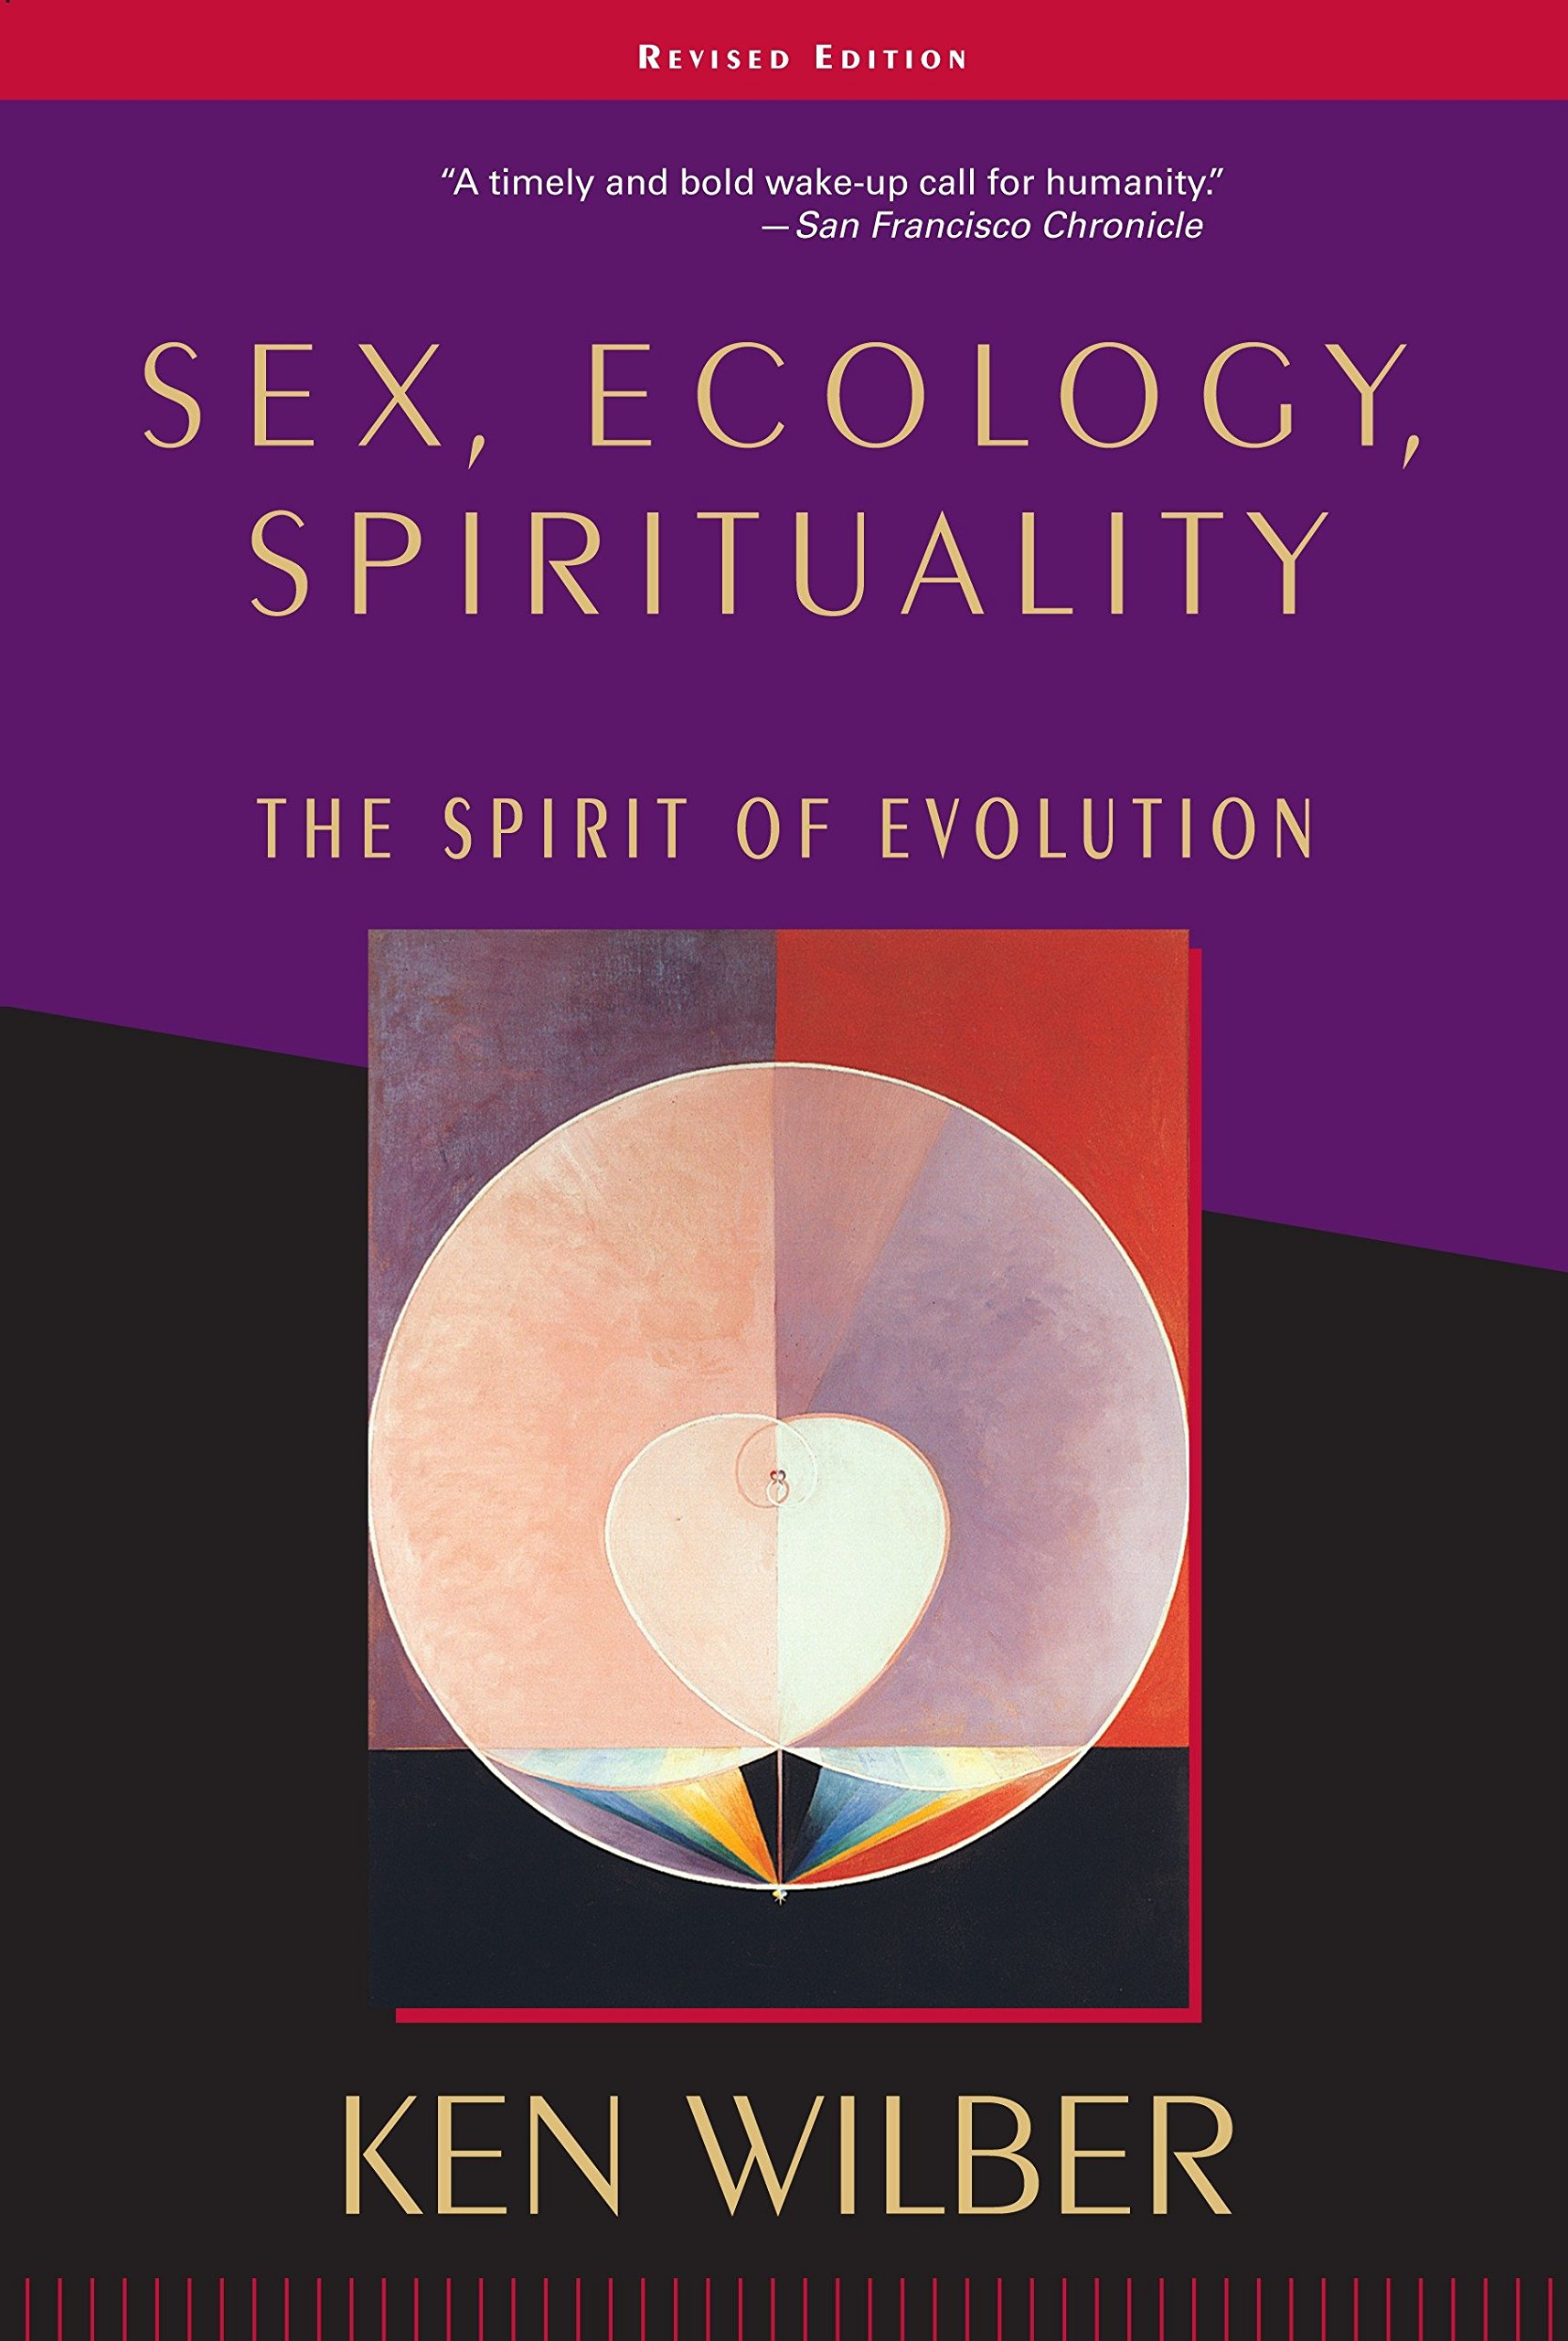 Ken Wilber - Sex, Ecology, Spirituality